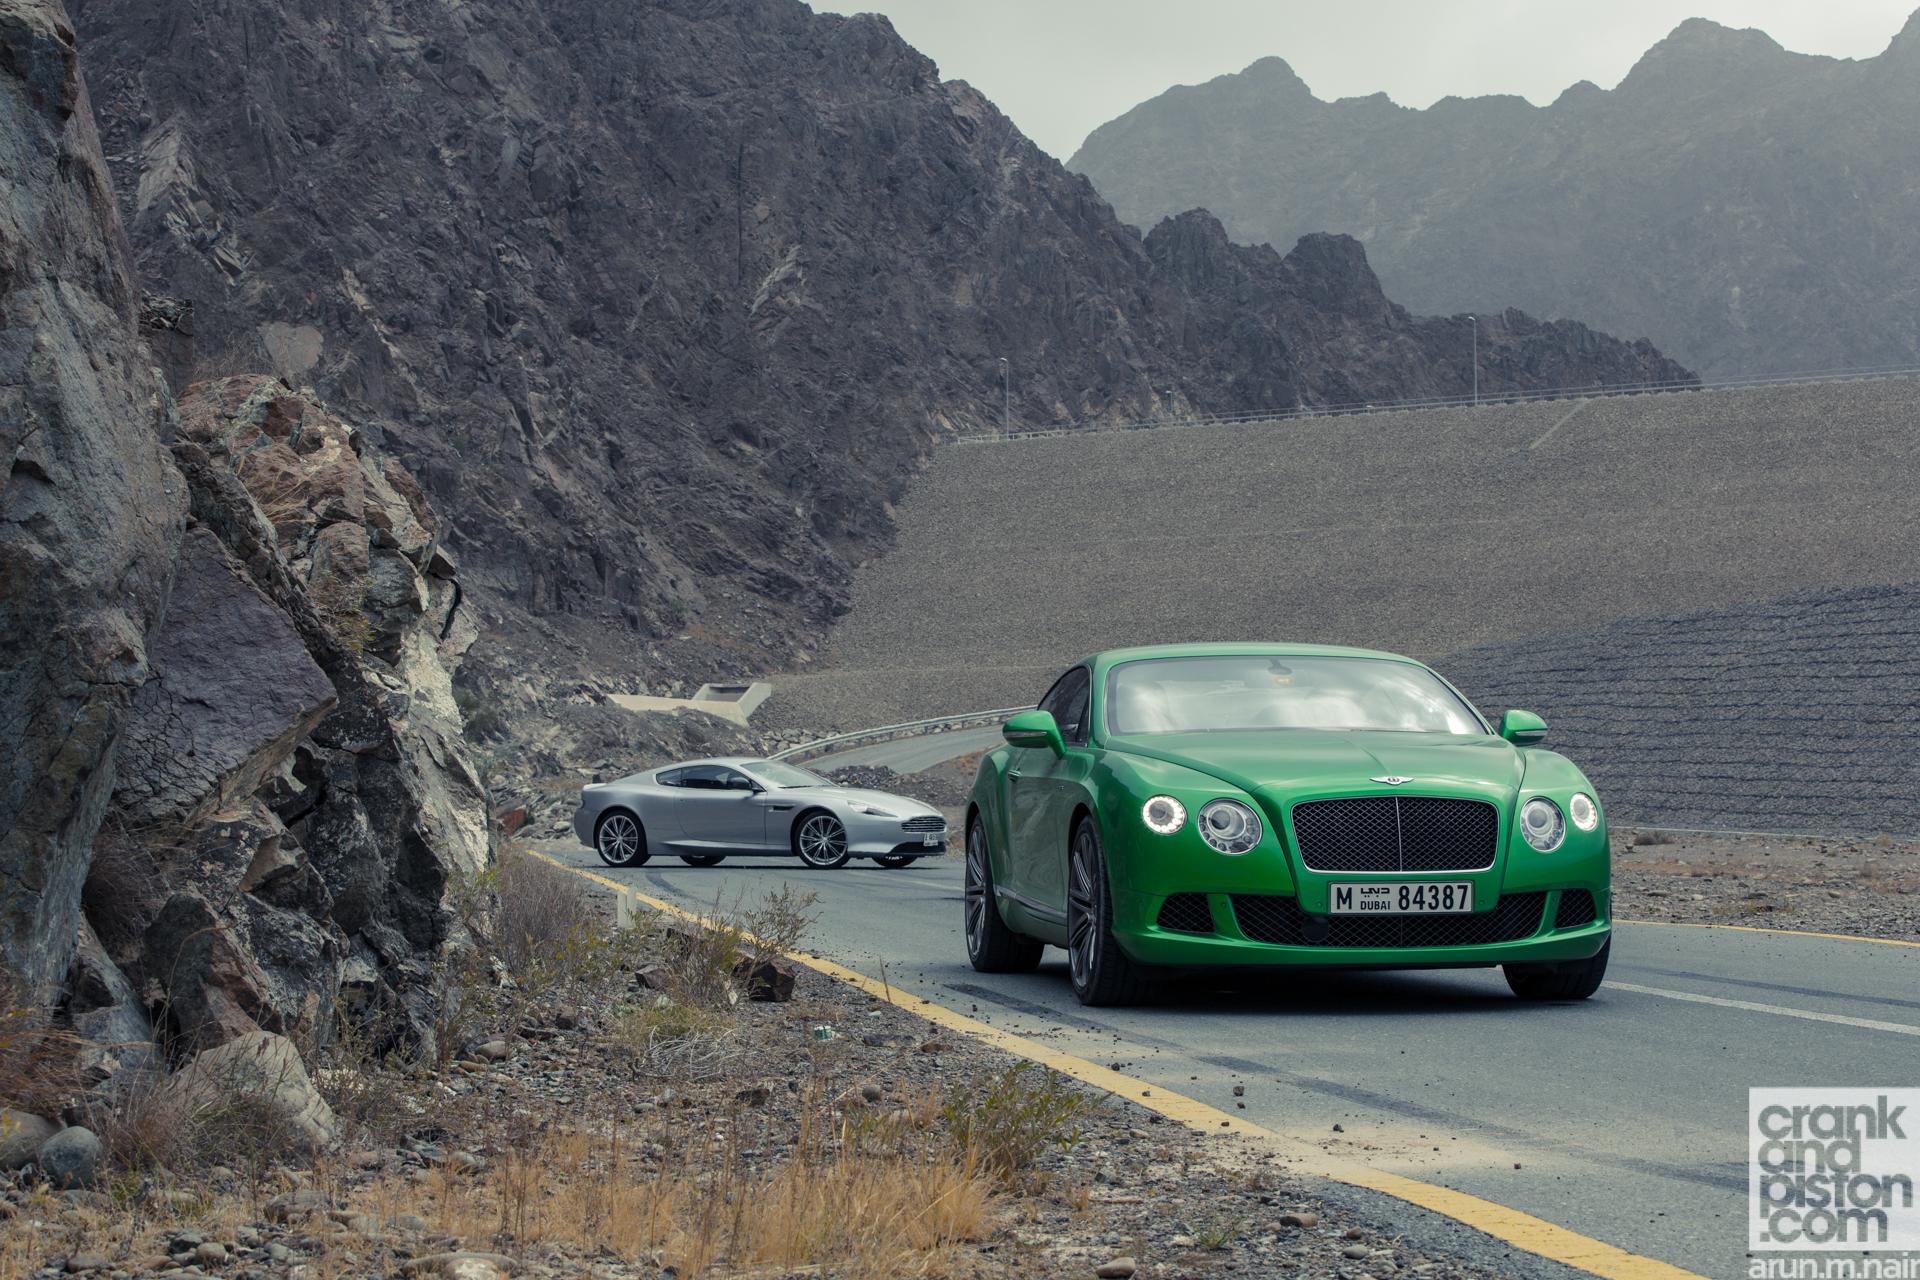 Aston Martin Db9 Vs Bentley Continental Gt Speed Crankandpiston Com